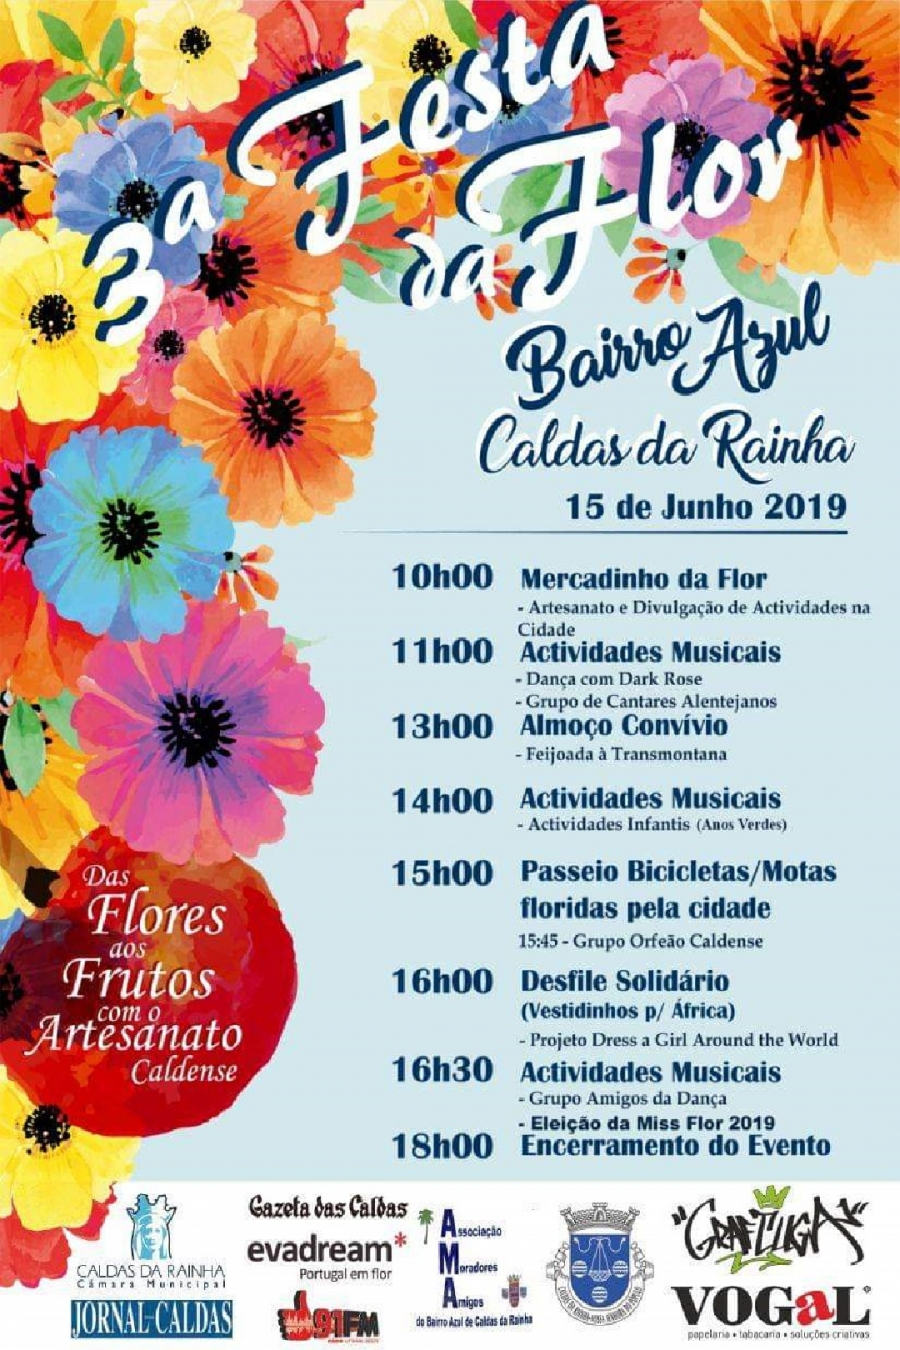 3º Festa da Flor - Bairro Azul